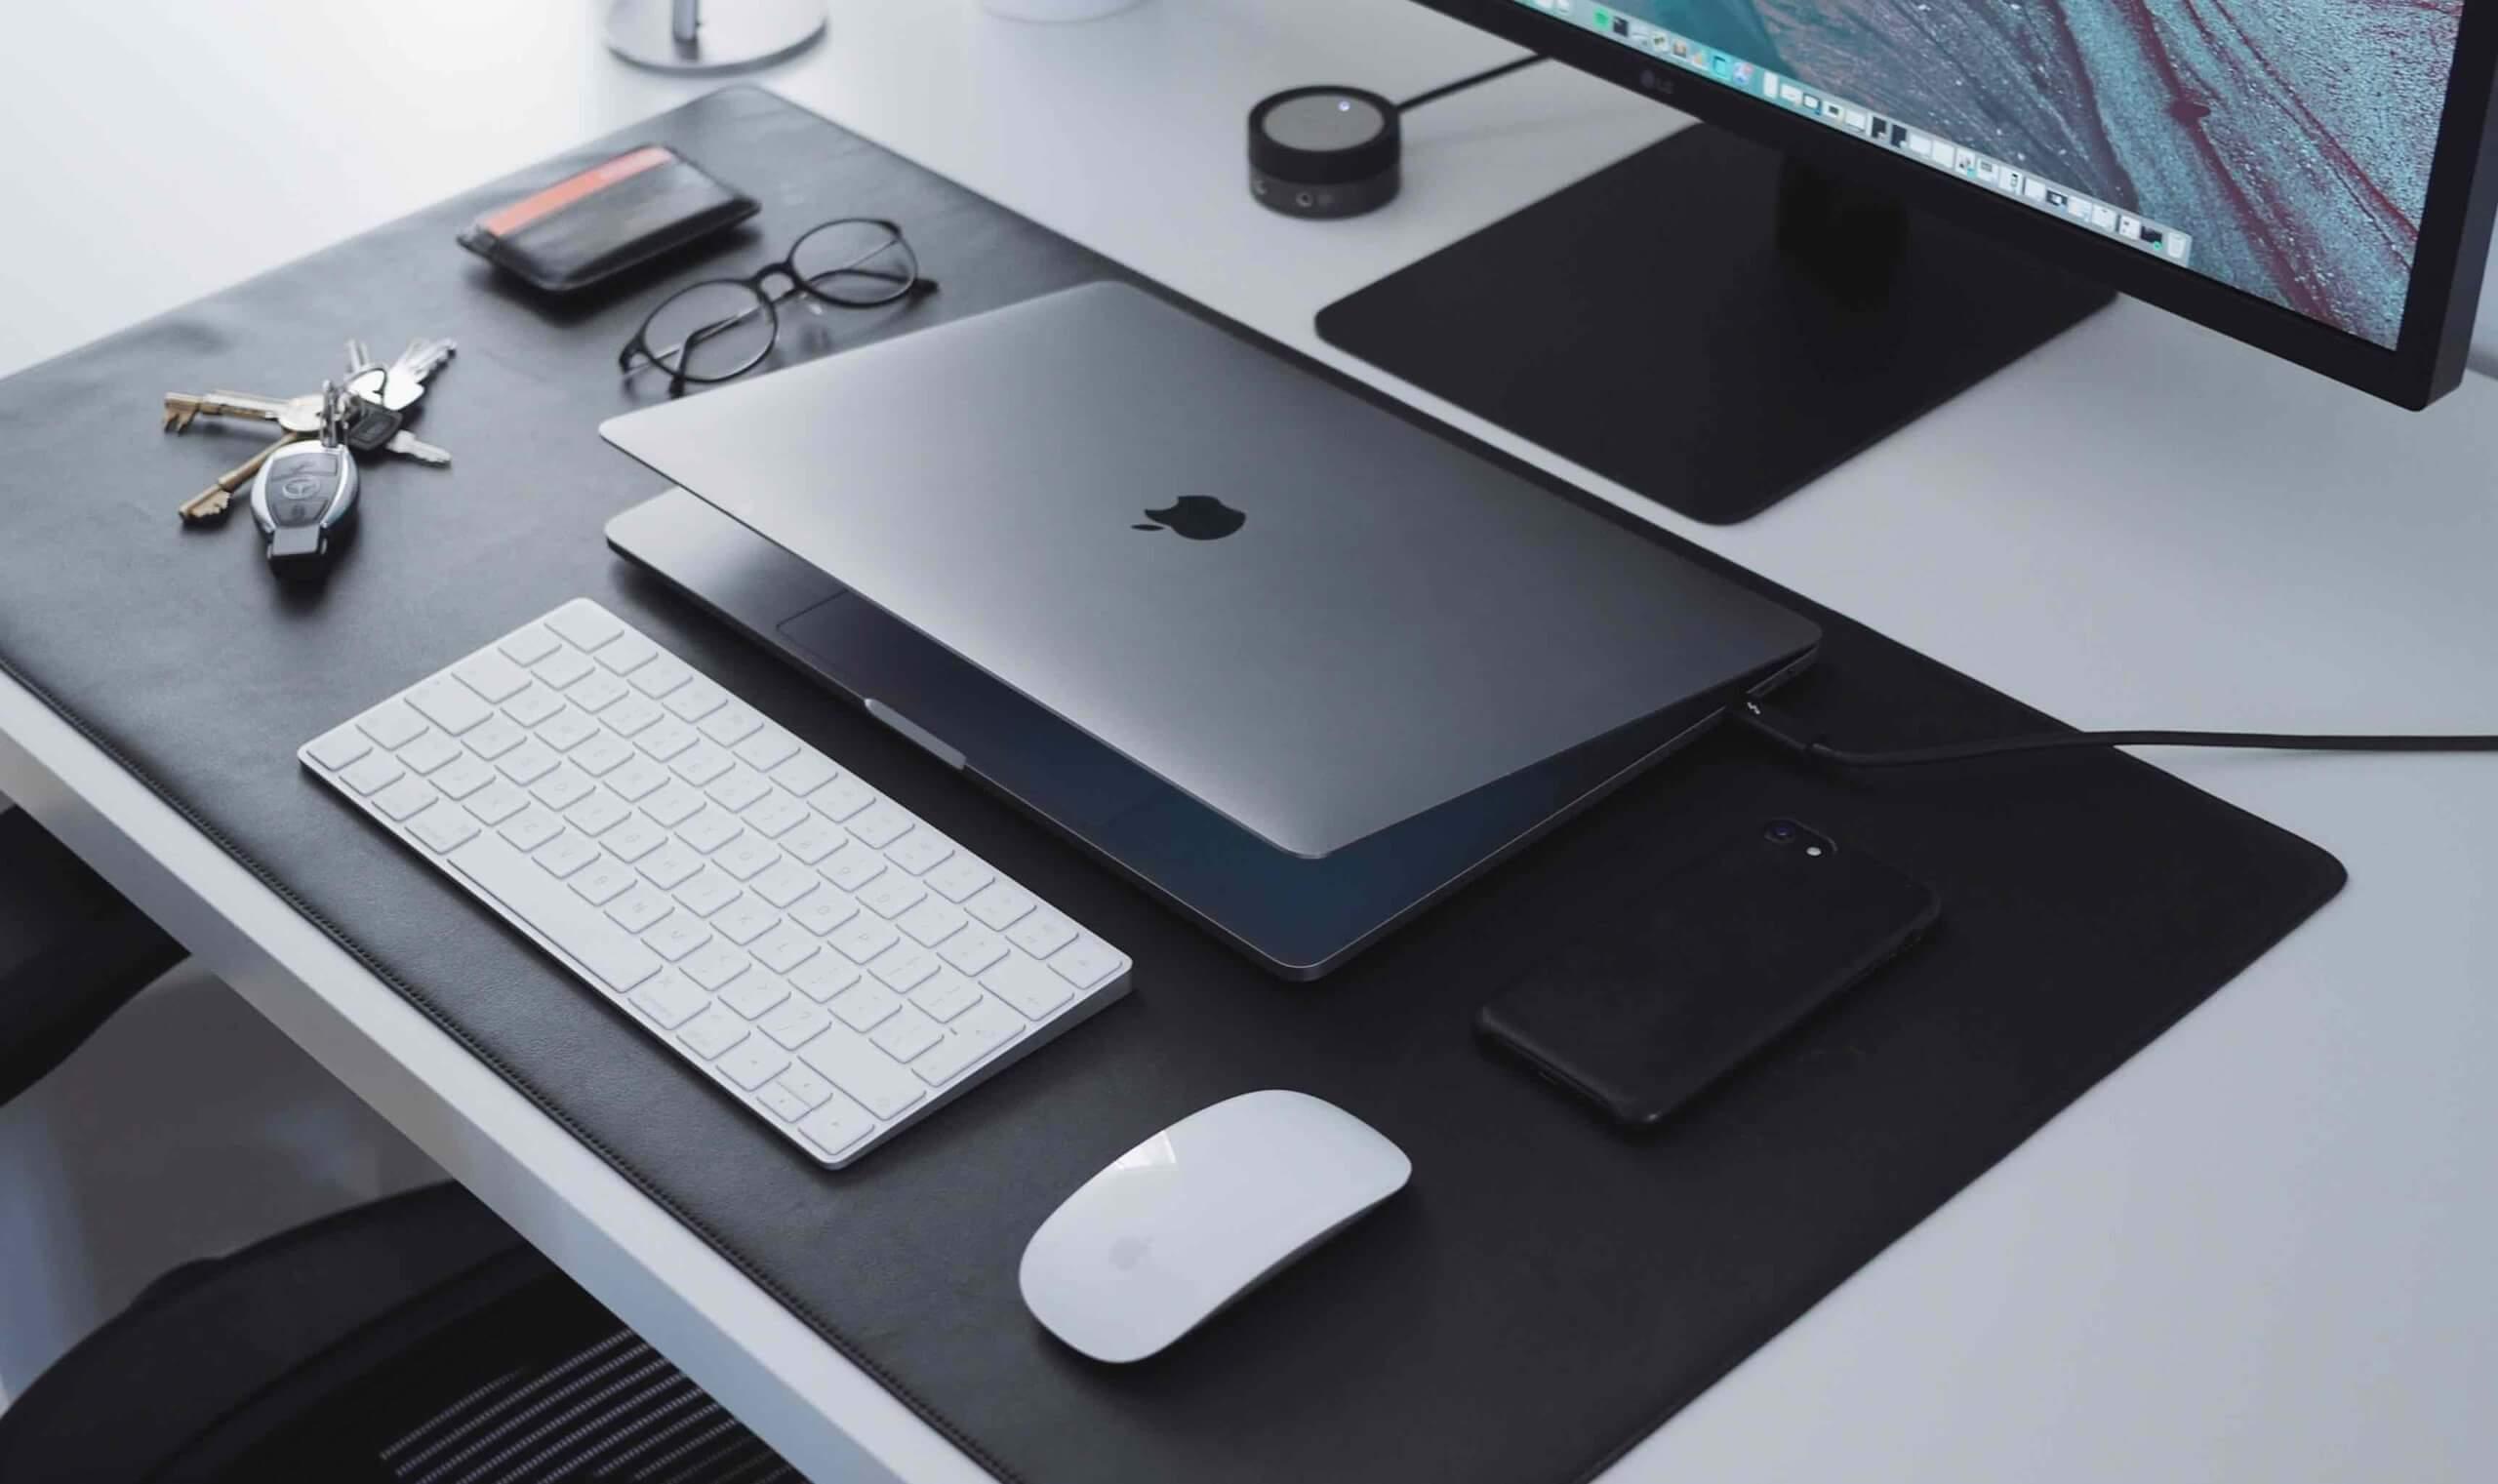 MacBookDeskSetSample